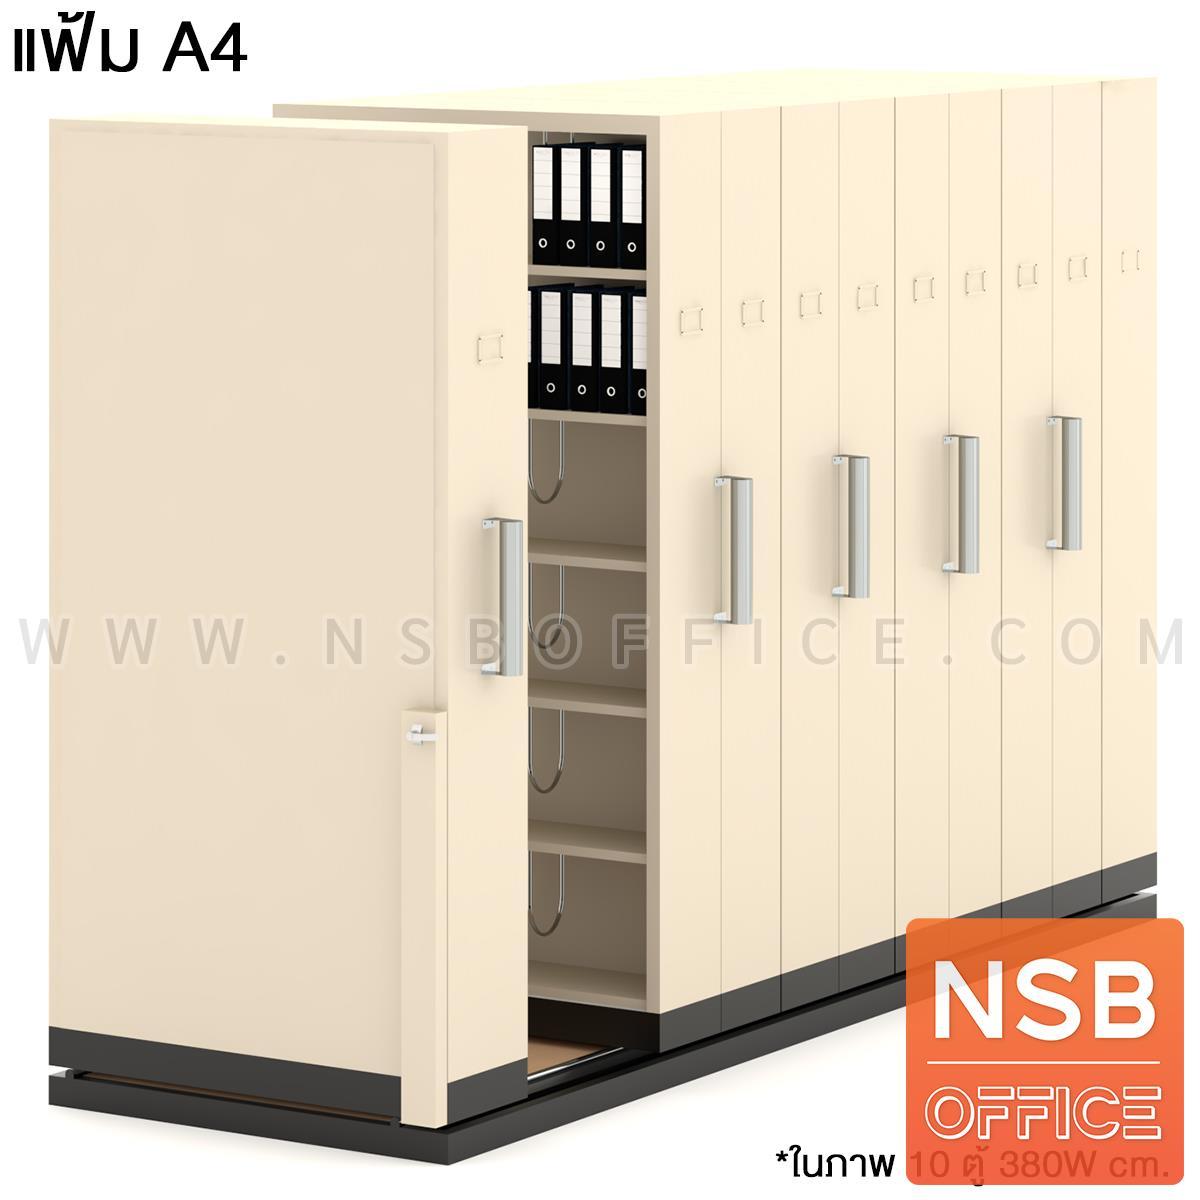 D02A029:ตู้รางเลื่อนแบบมือผลัก   121.7D cm ขนาด 4, 6, 8, 10, 12, 14, 16 ตู้ สำหรับแฟ้ม A4